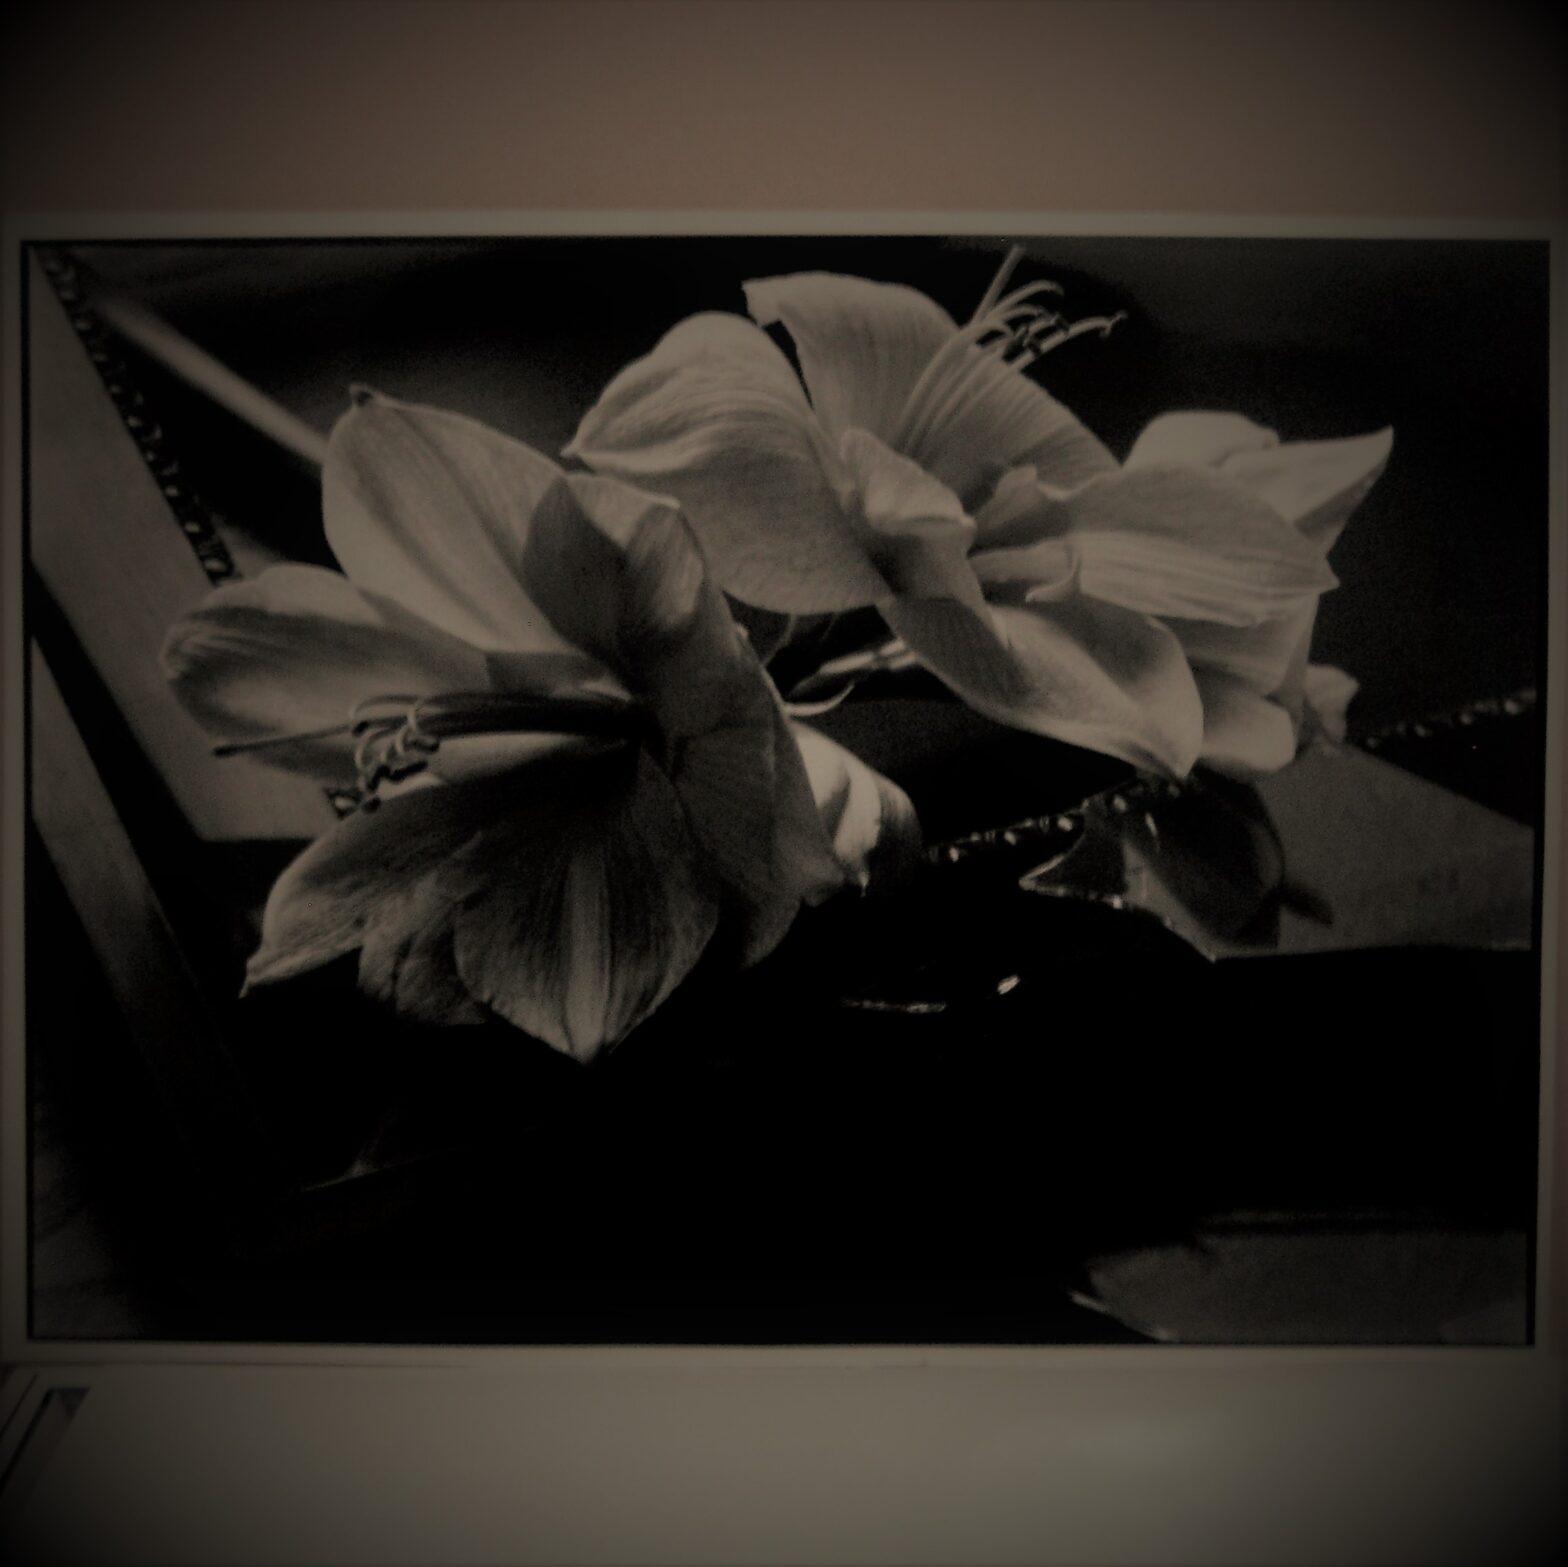 Stillife Black and white photography